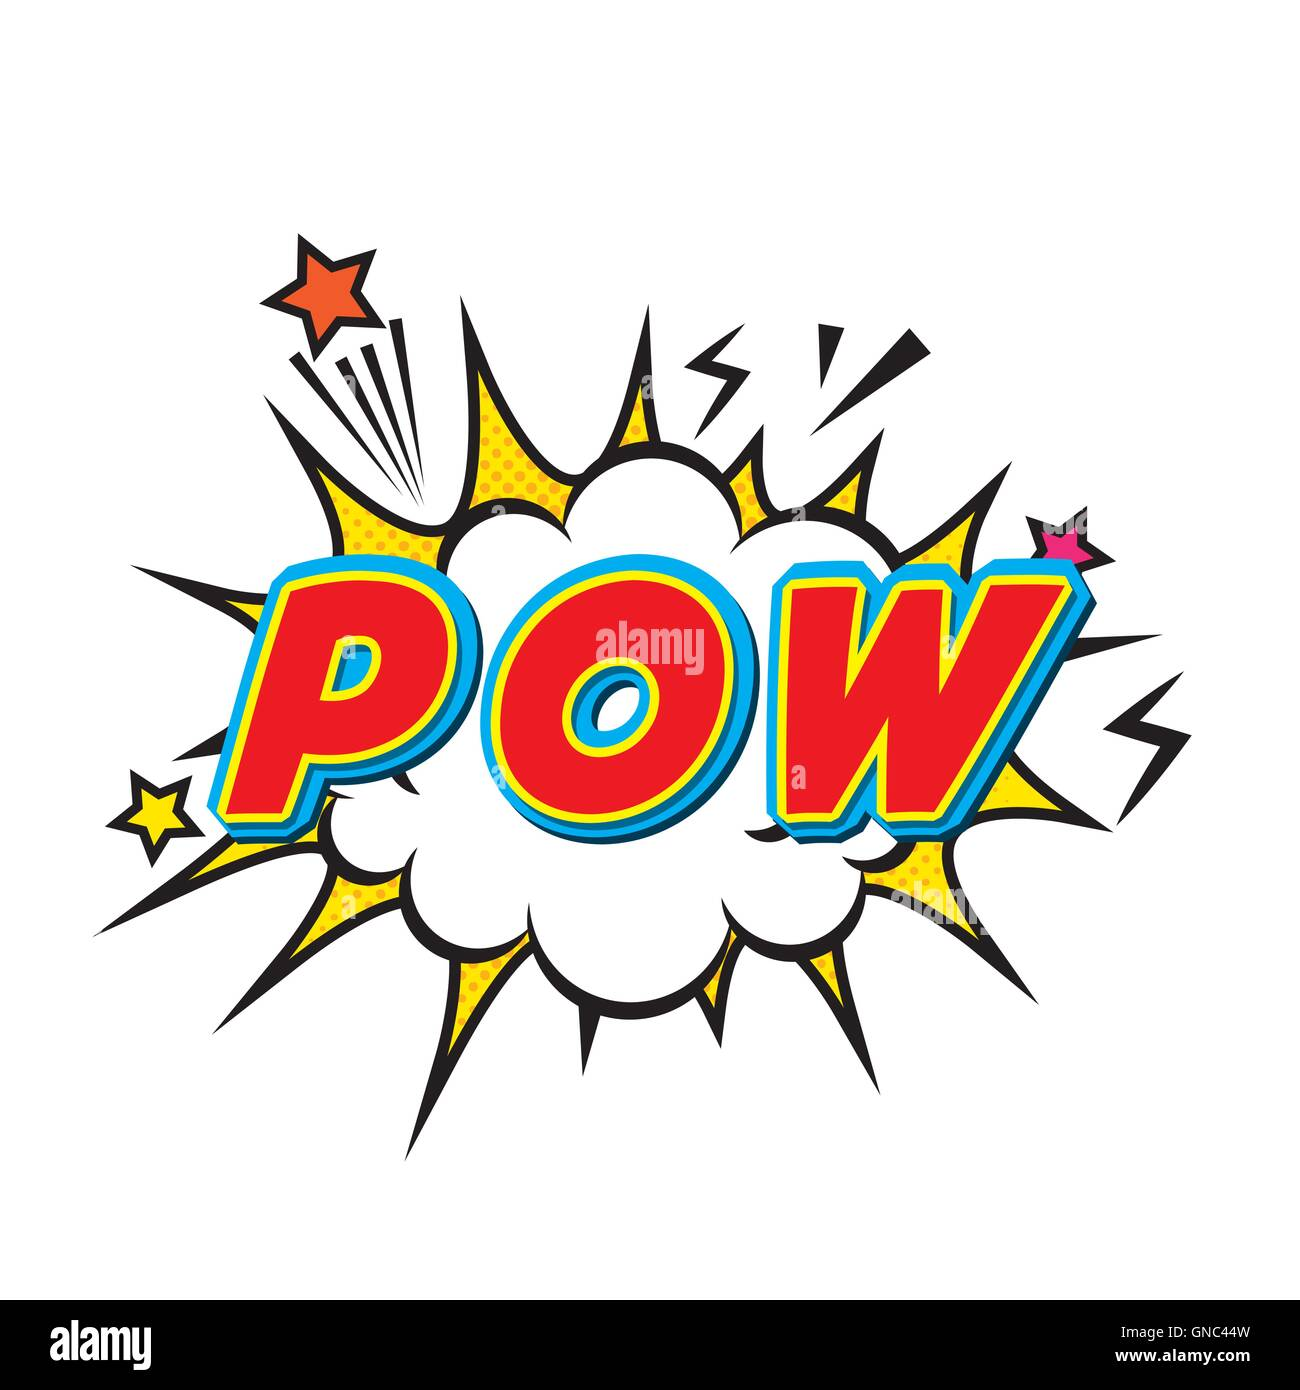 pow comic pop art style stock vector art amp illustration